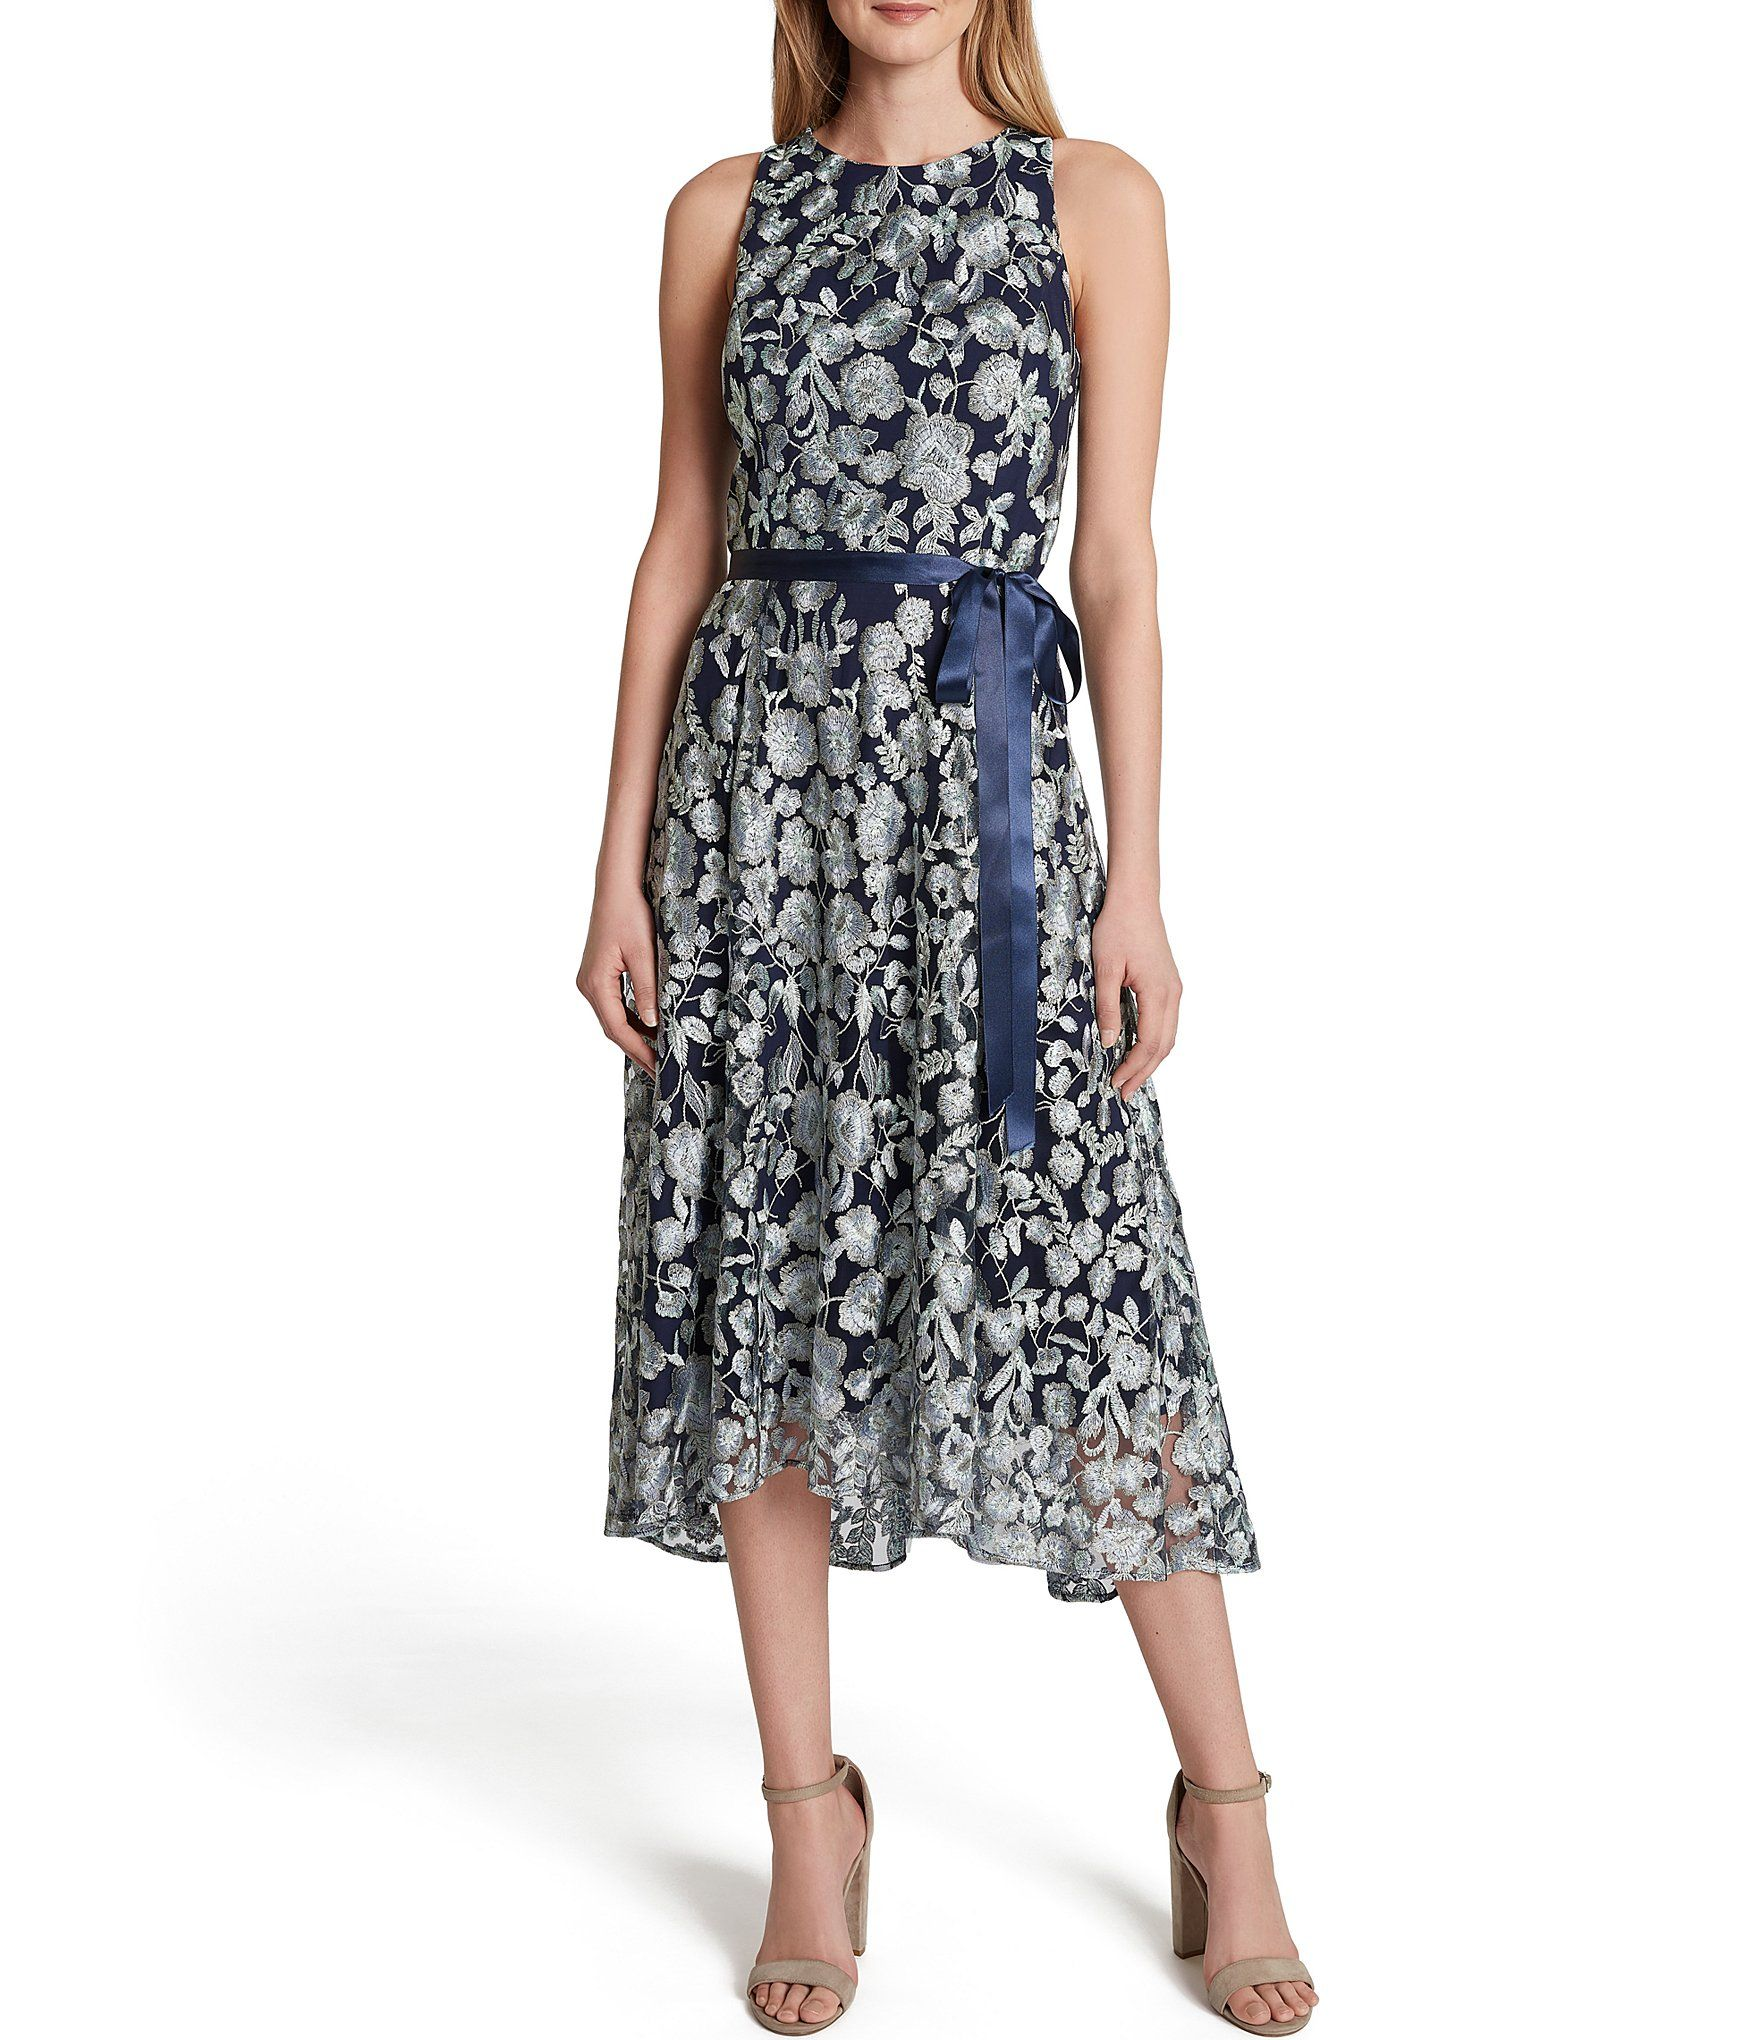 Tahari Asl Petite Size Sleeveless Floral Embroidered Mesh Satin Ribbon Tie Waist A Line Midi Dress Dillard S Flared Skirt Dress Embroidered Midi Dress Floral Shirt Dress [ 2040 x 1760 Pixel ]